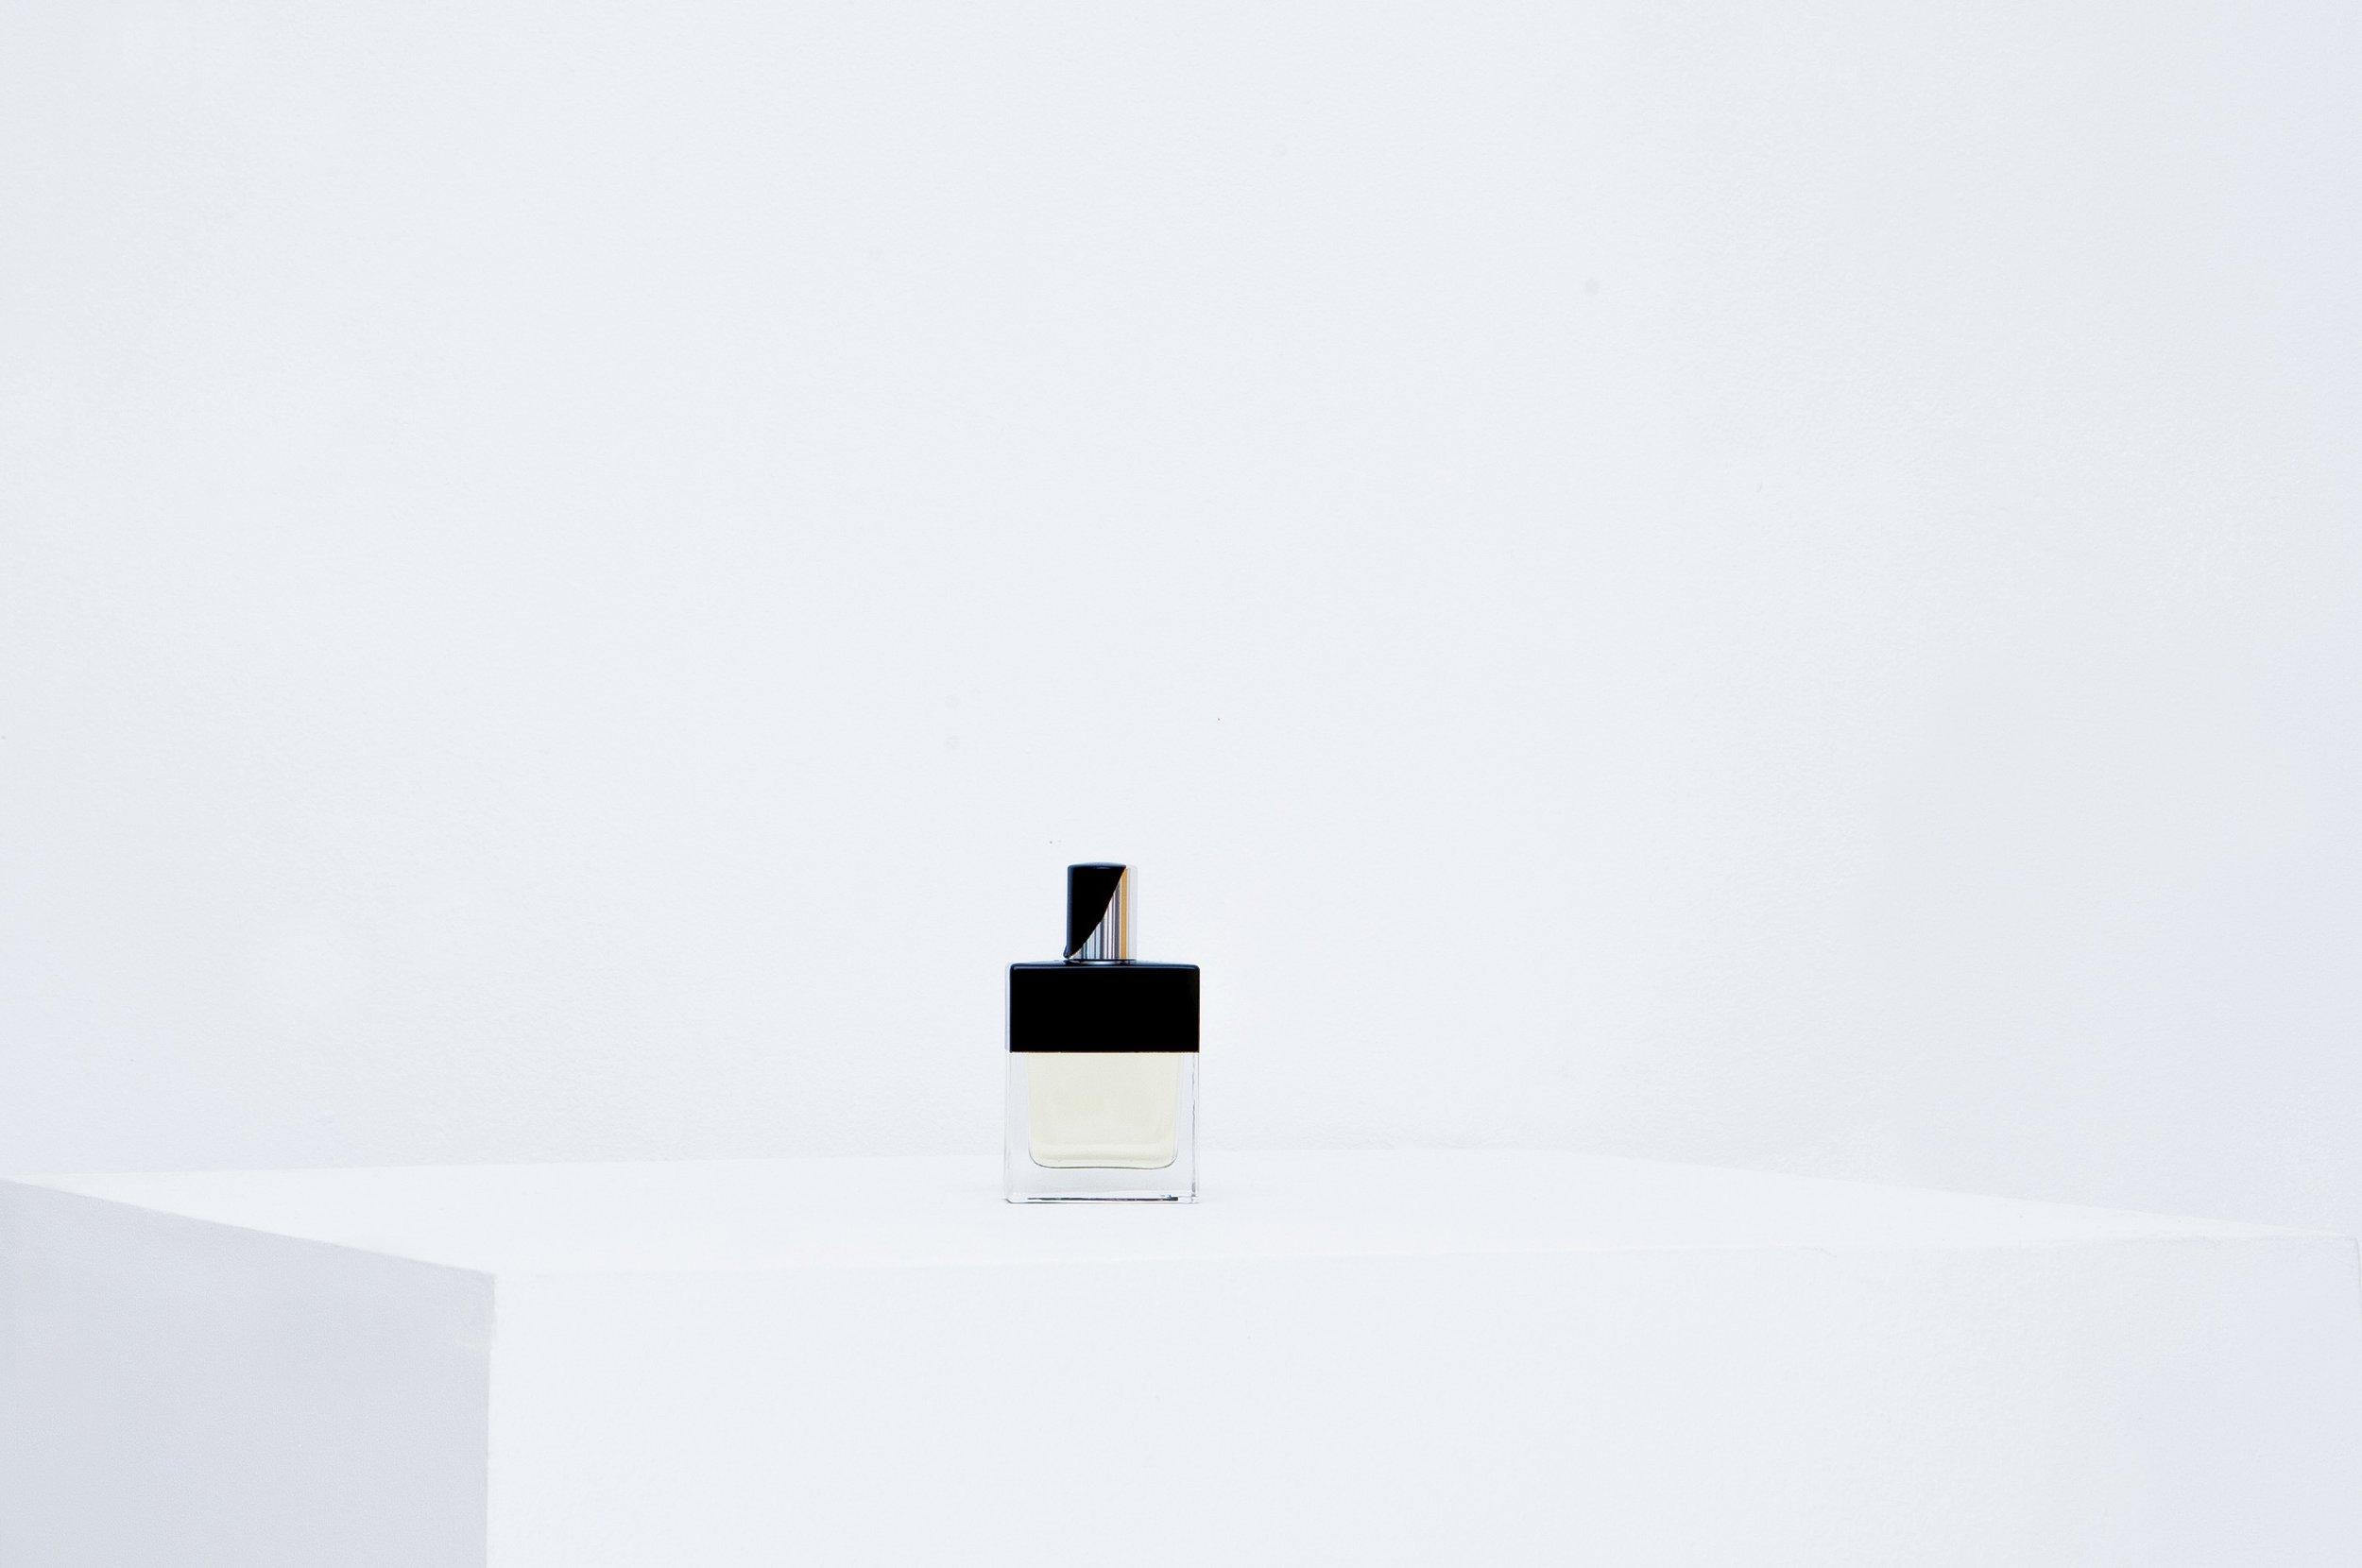 le-cinema-olfactif-duke-of-burgundy-perfume-folie-a-plusieurs-parfums.JPG